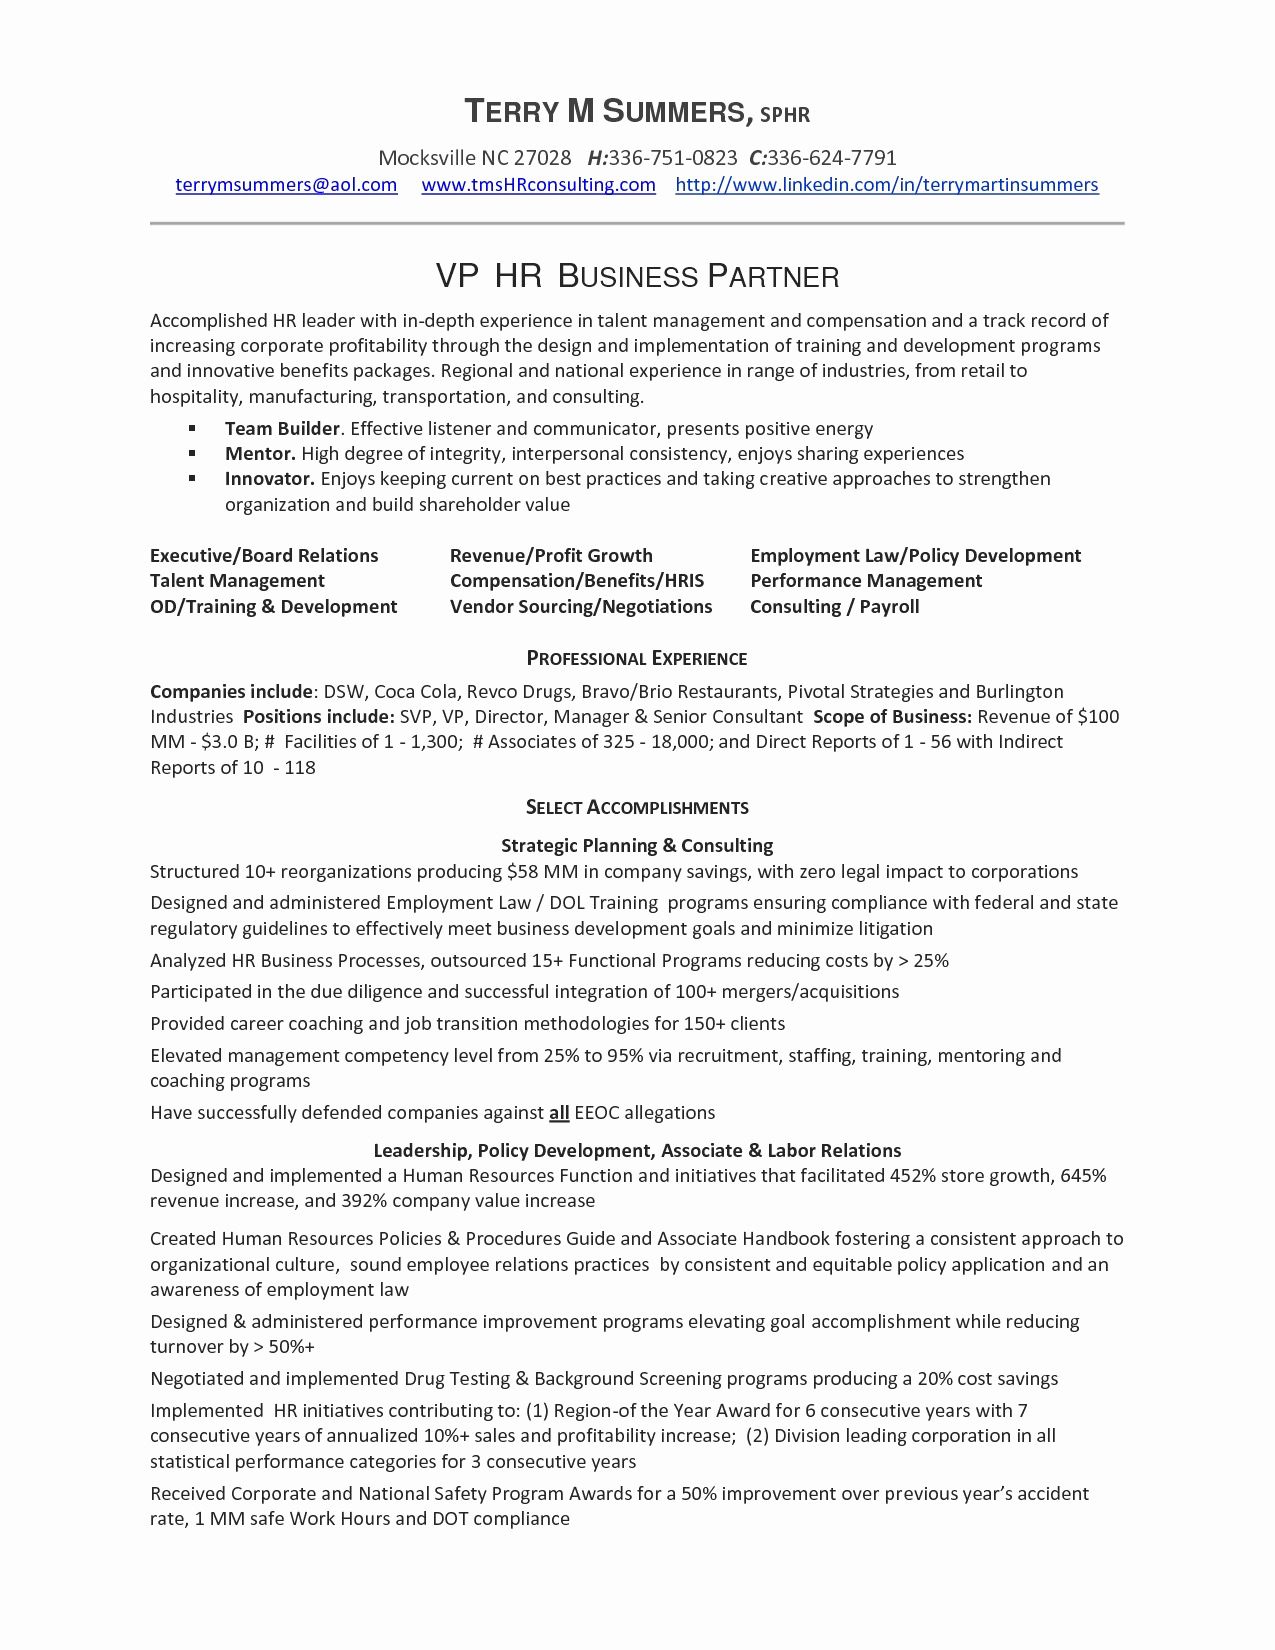 Vendor Letter Template - Resume Templates Doc Fresh Business Analyst Resume Sample Doc